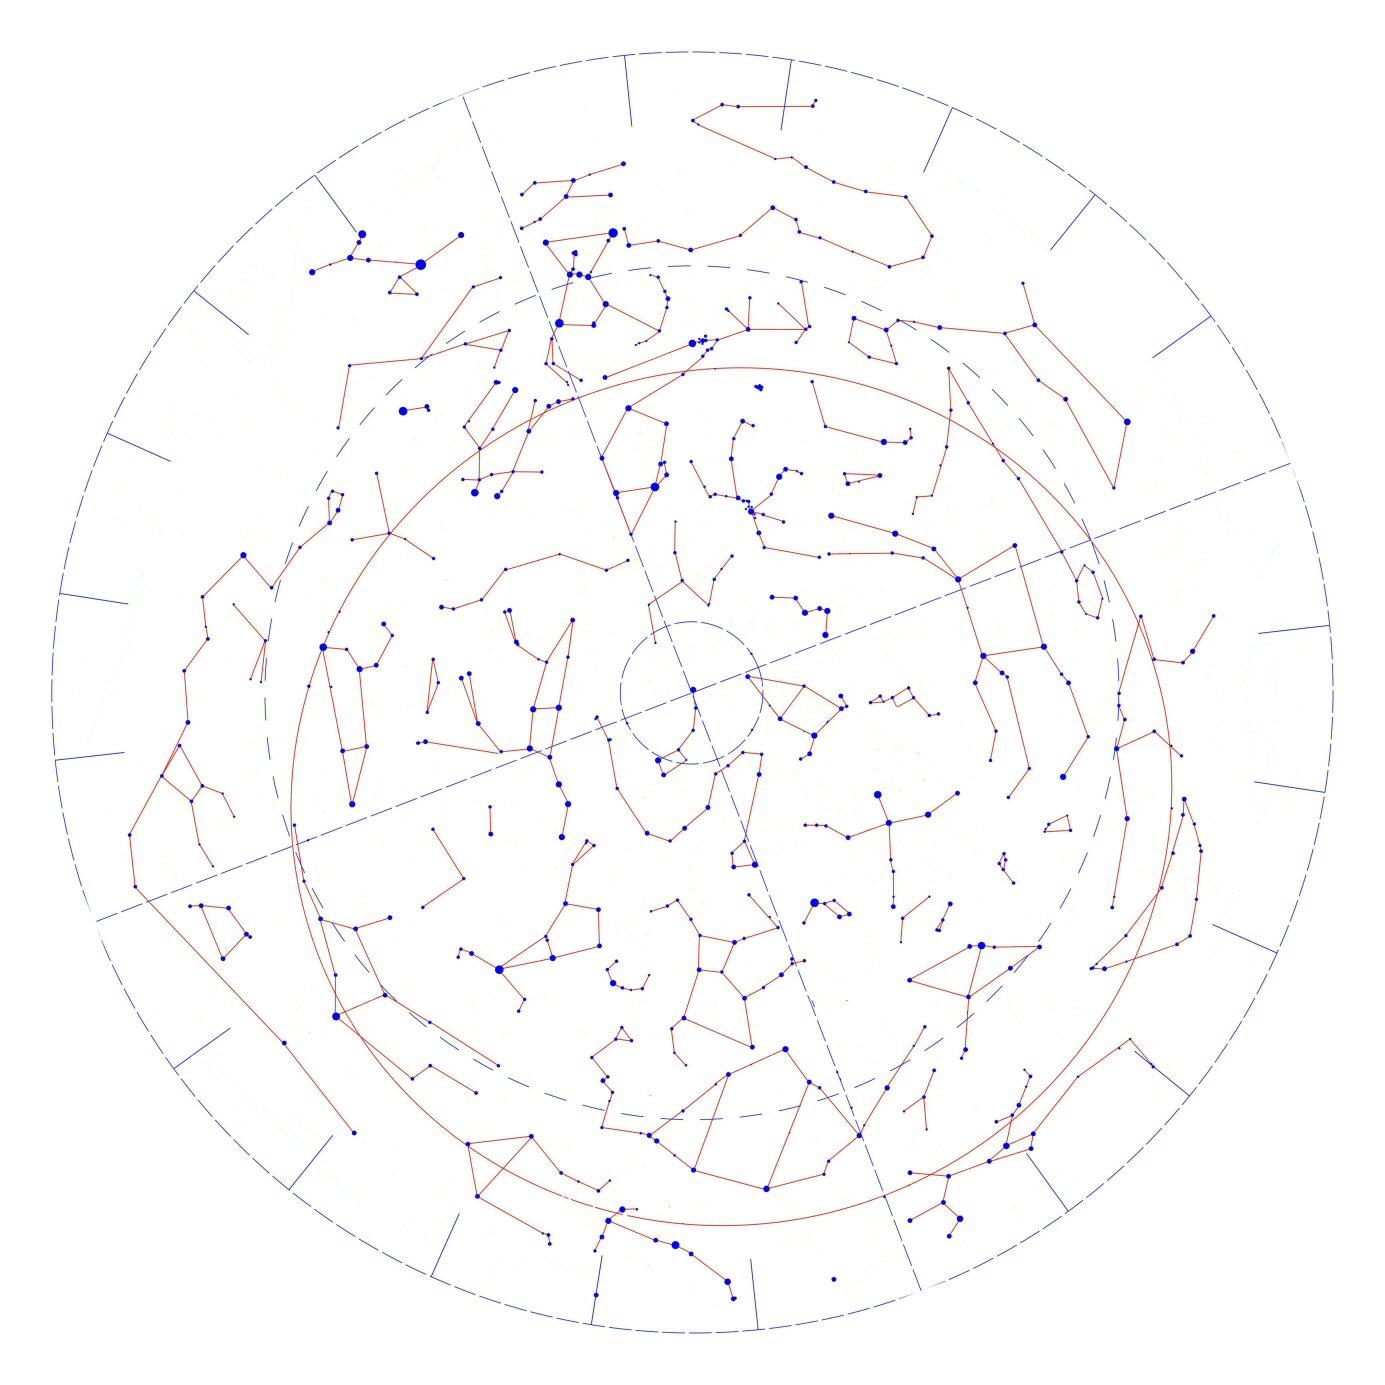 The Many Layers of the VLZ (Victoria Landscape Zodiac